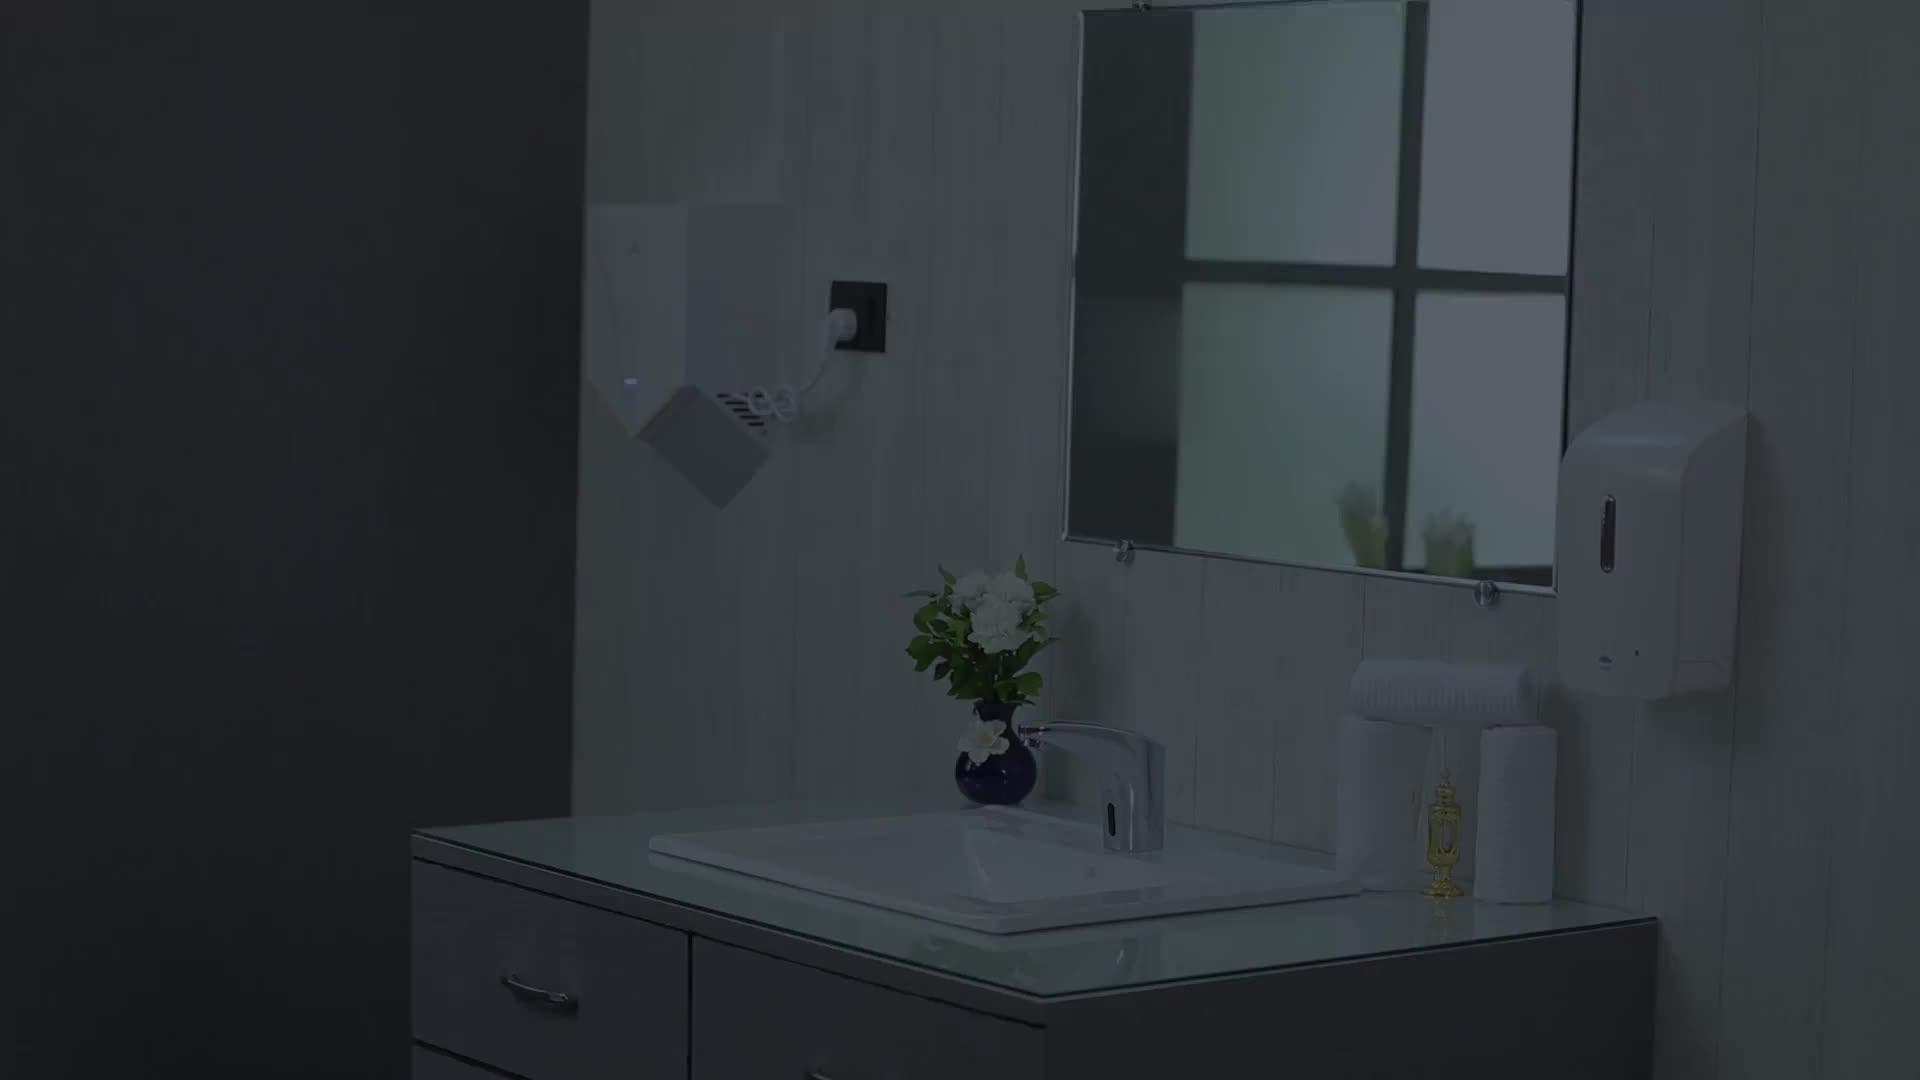 קיר רכוב אלקטרוני חיישן touchless נוזל אוטומטי סבון dispenser